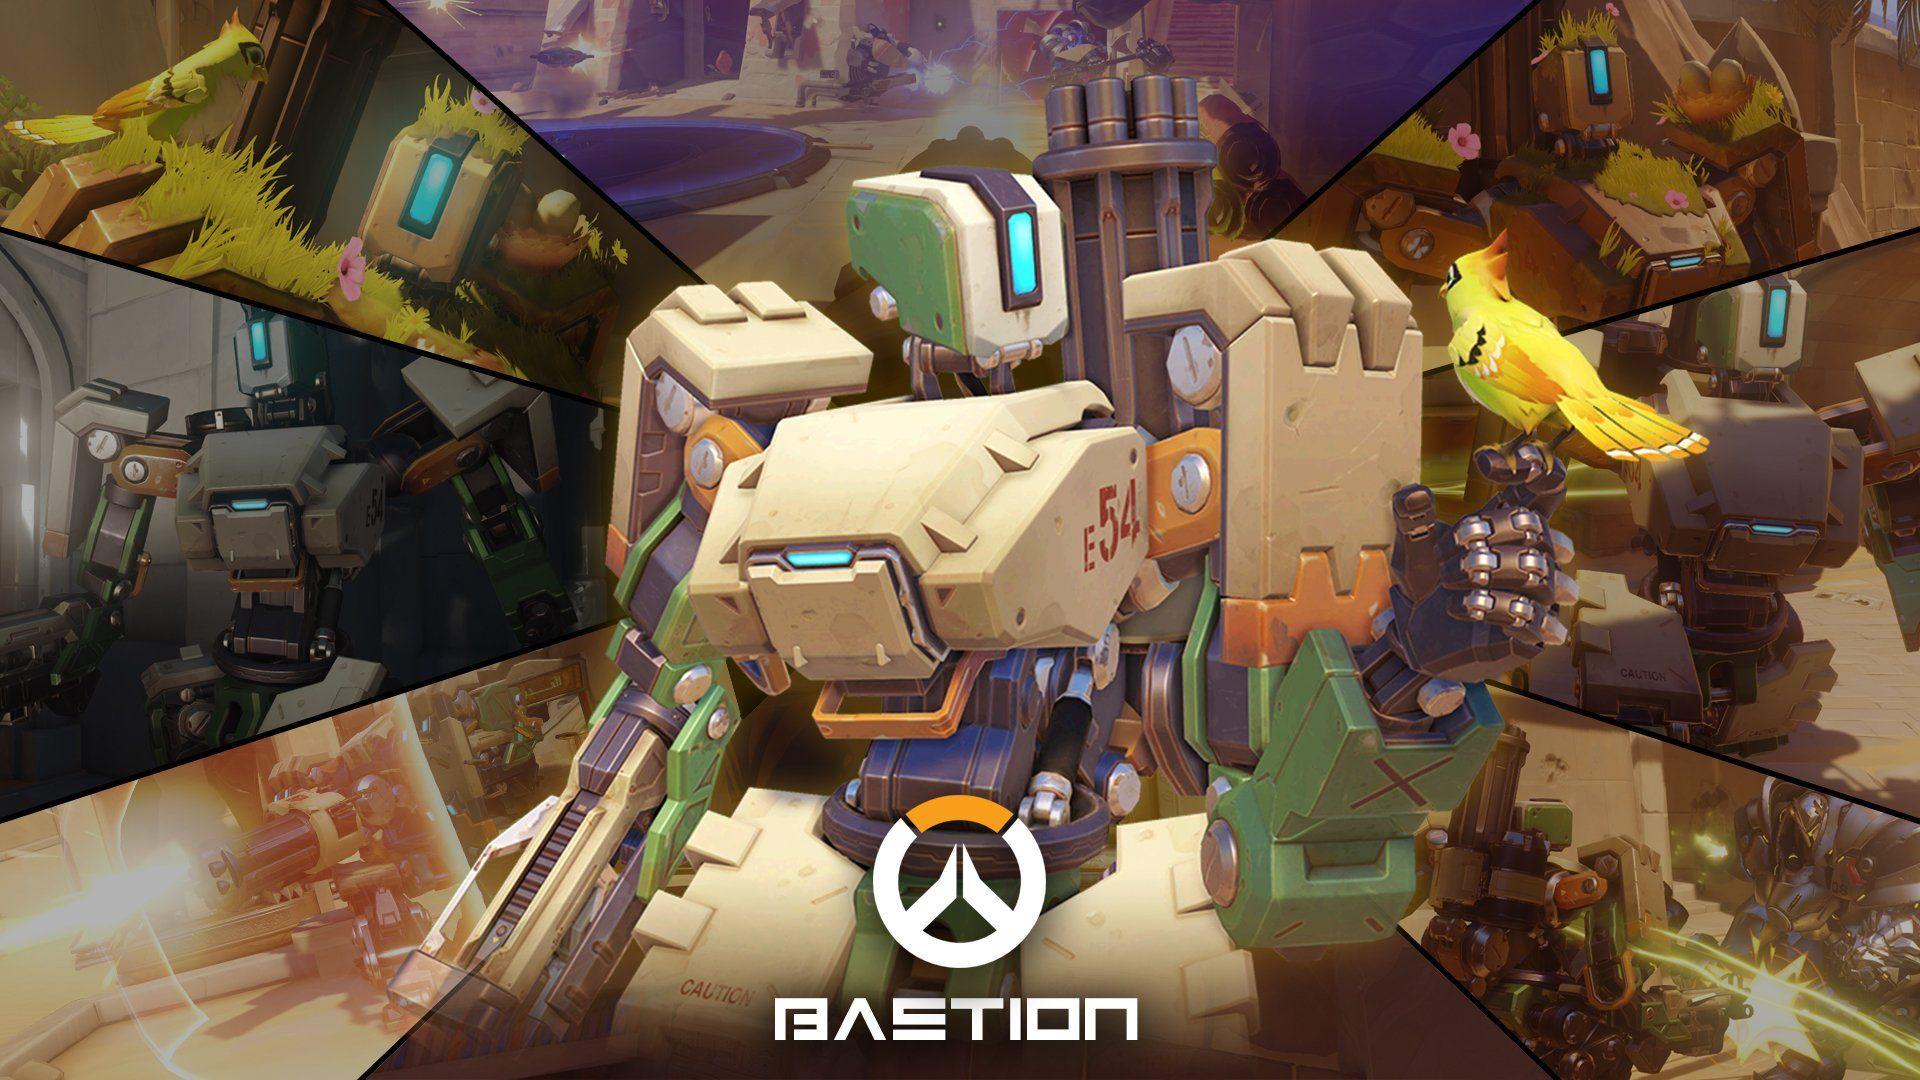 Video Game Overwatch Bastion Overwatch Wallpaper Overwatch Wallpapers Overwatch Overwatch Bastion